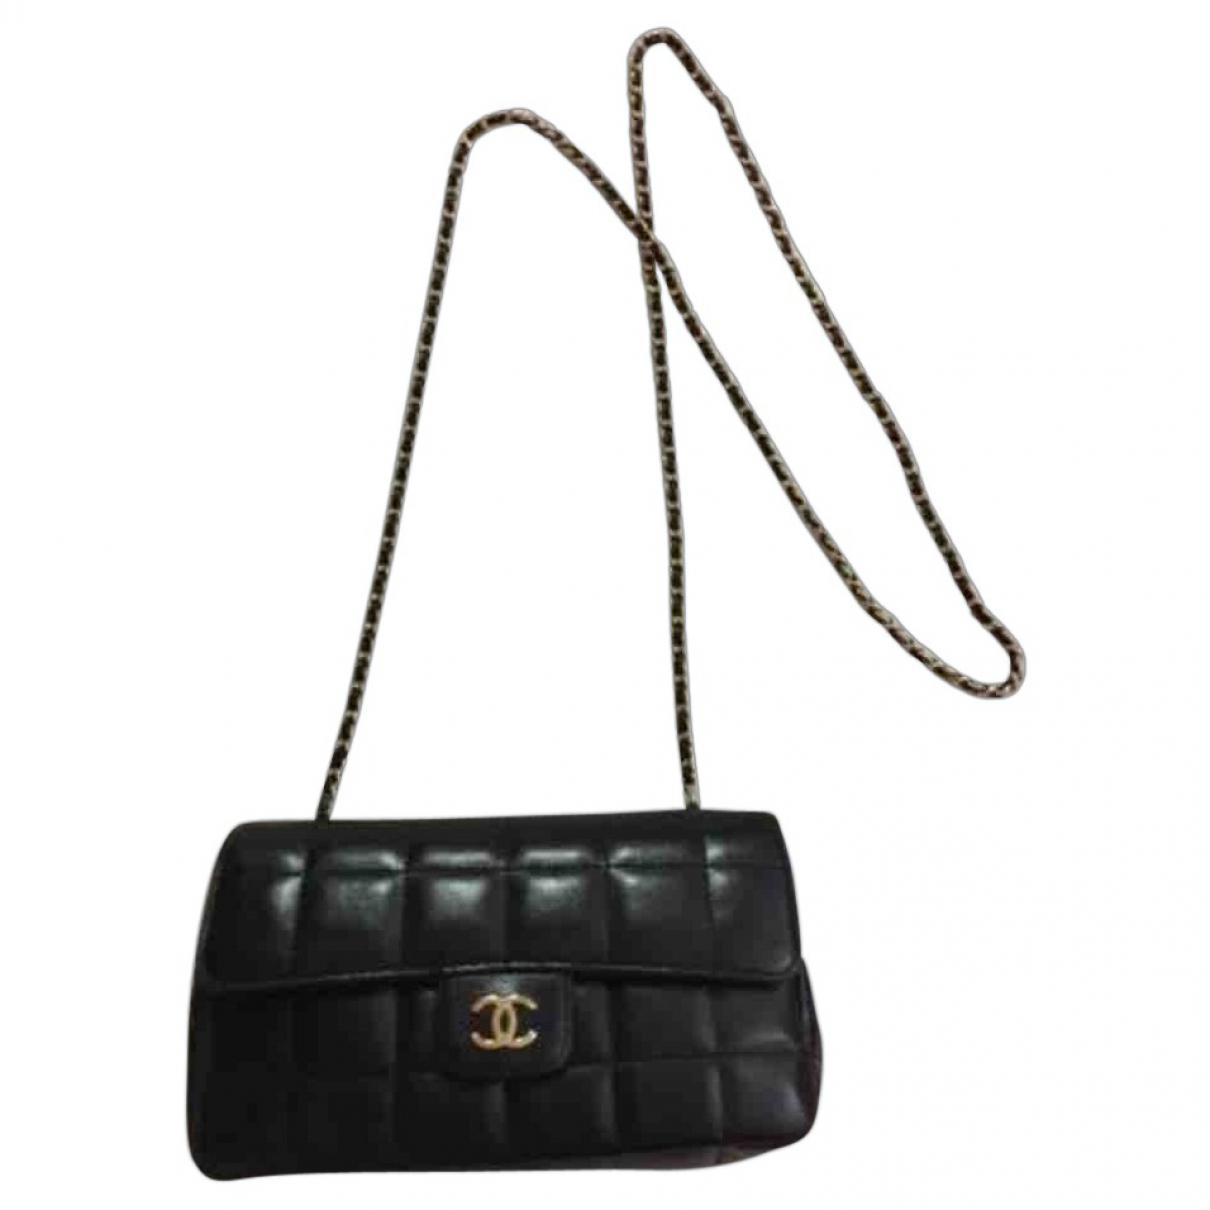 Lyst - Chanel Timeless Leather Crossbody Bag in Black fd5a8eae185